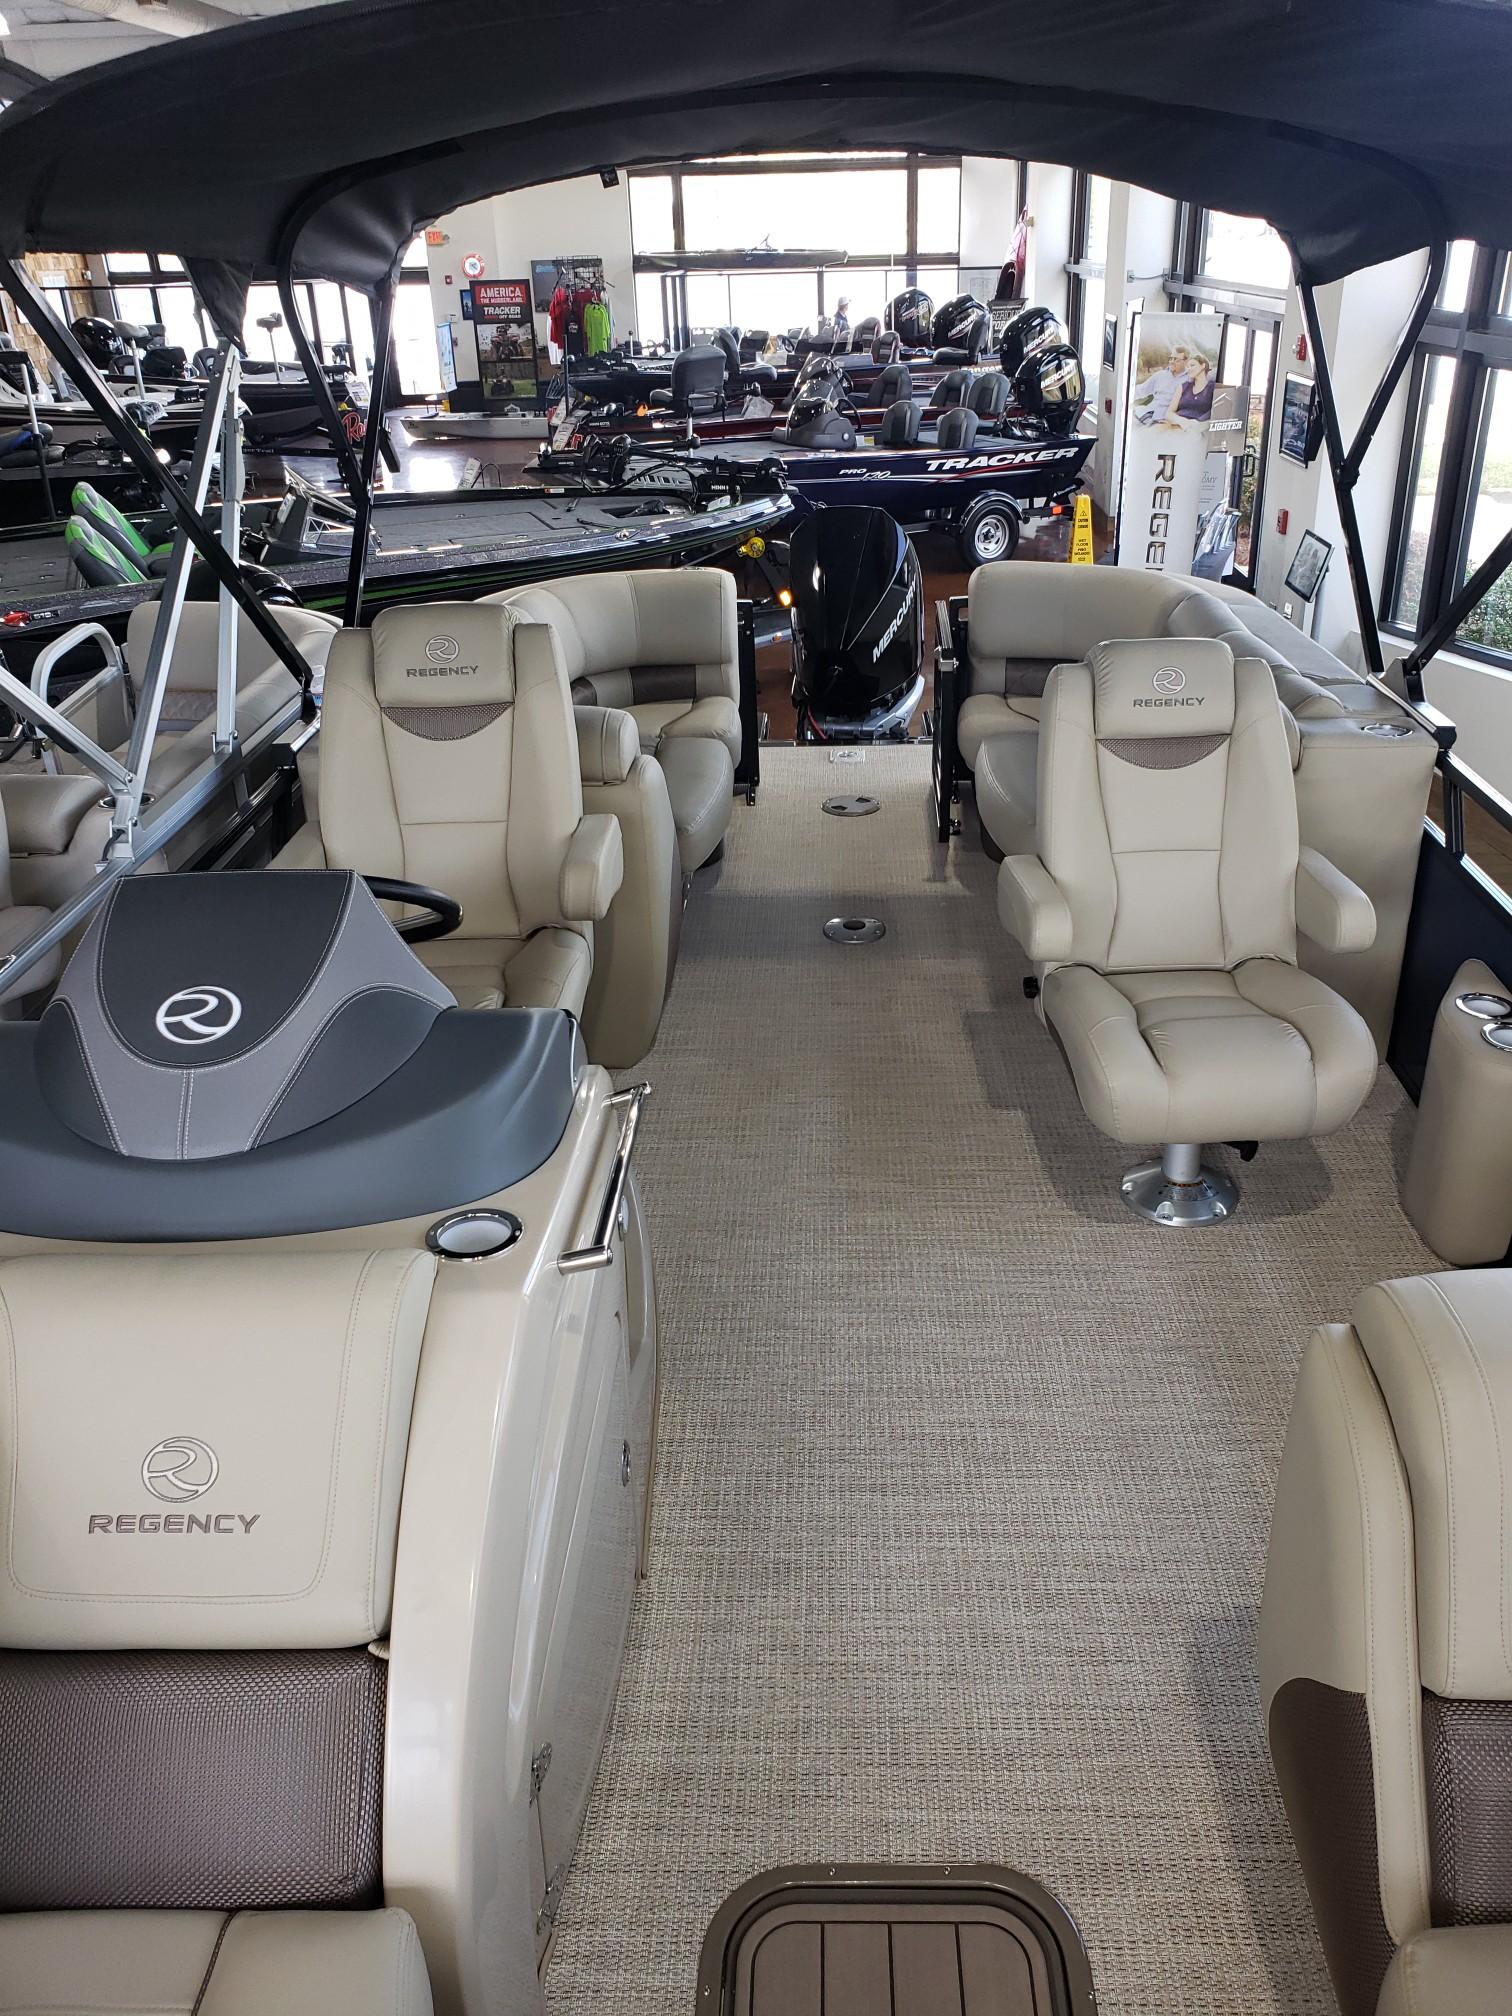 2020 Regency boat for sale, model of the boat is 250 LE3 w/300L Verado & Image # 21 of 27